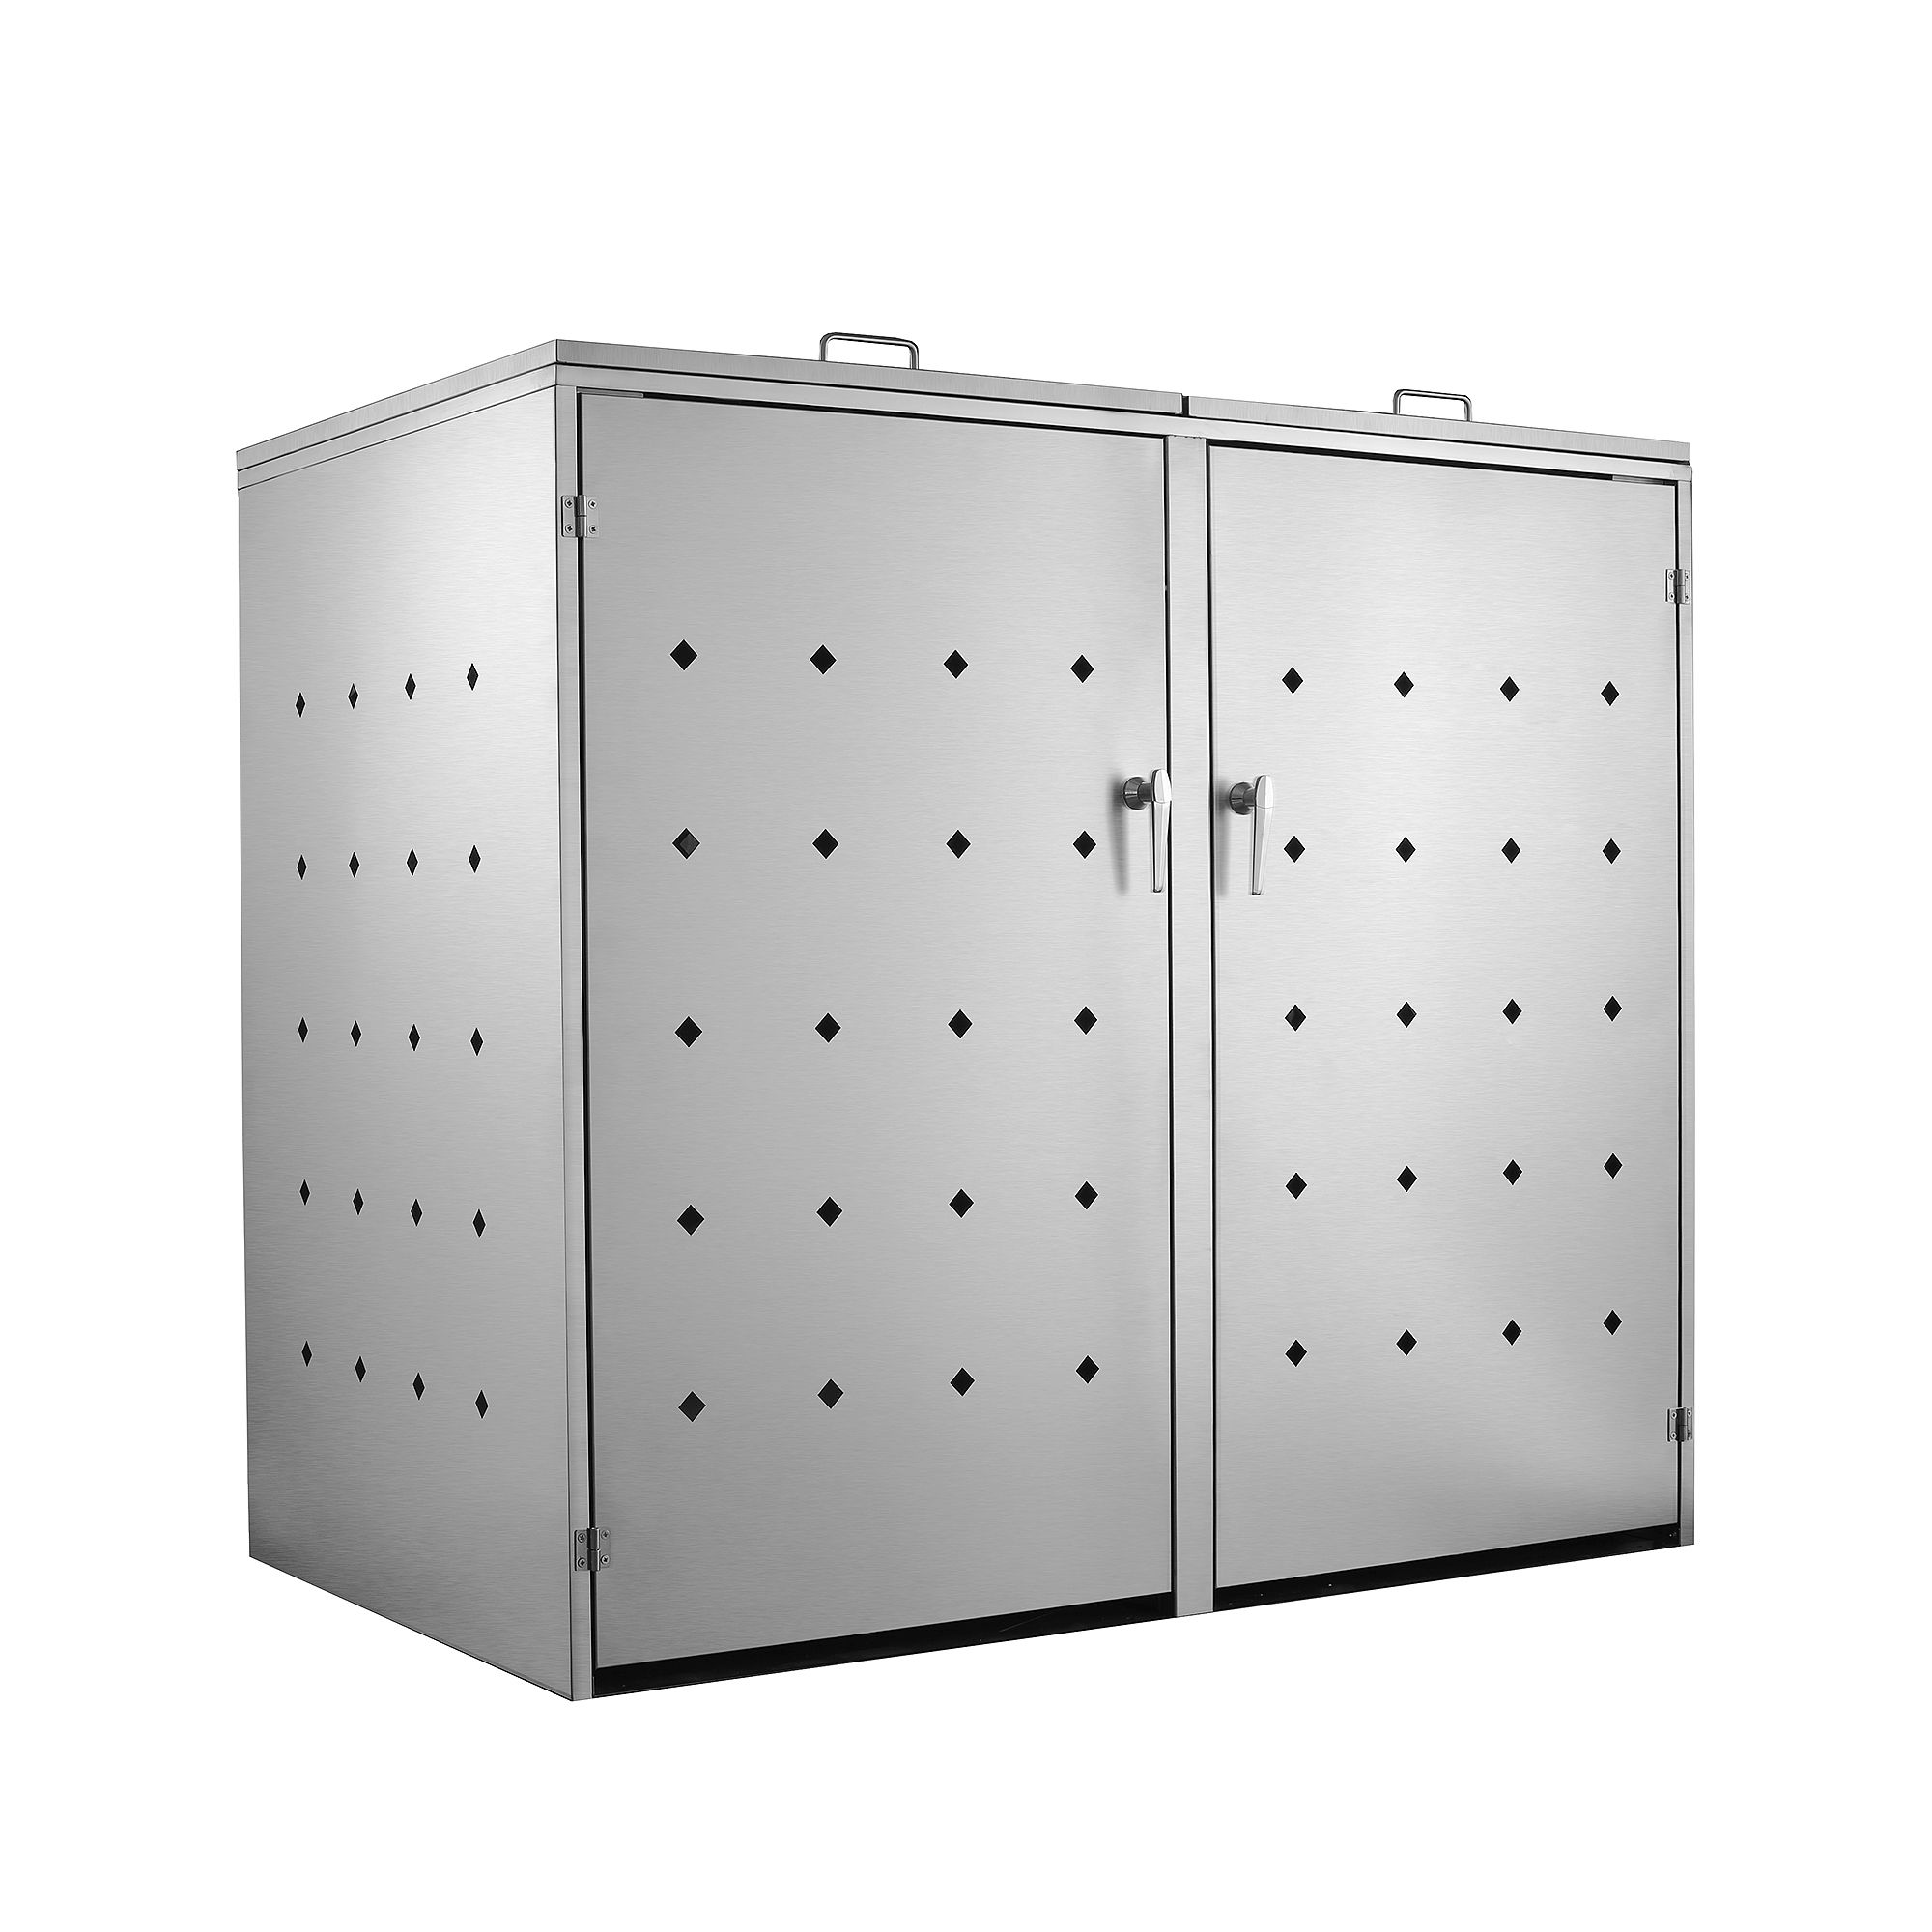 edelstahl mülltonnenbox rhombus 2er müllbox mülltonnenverkleidung